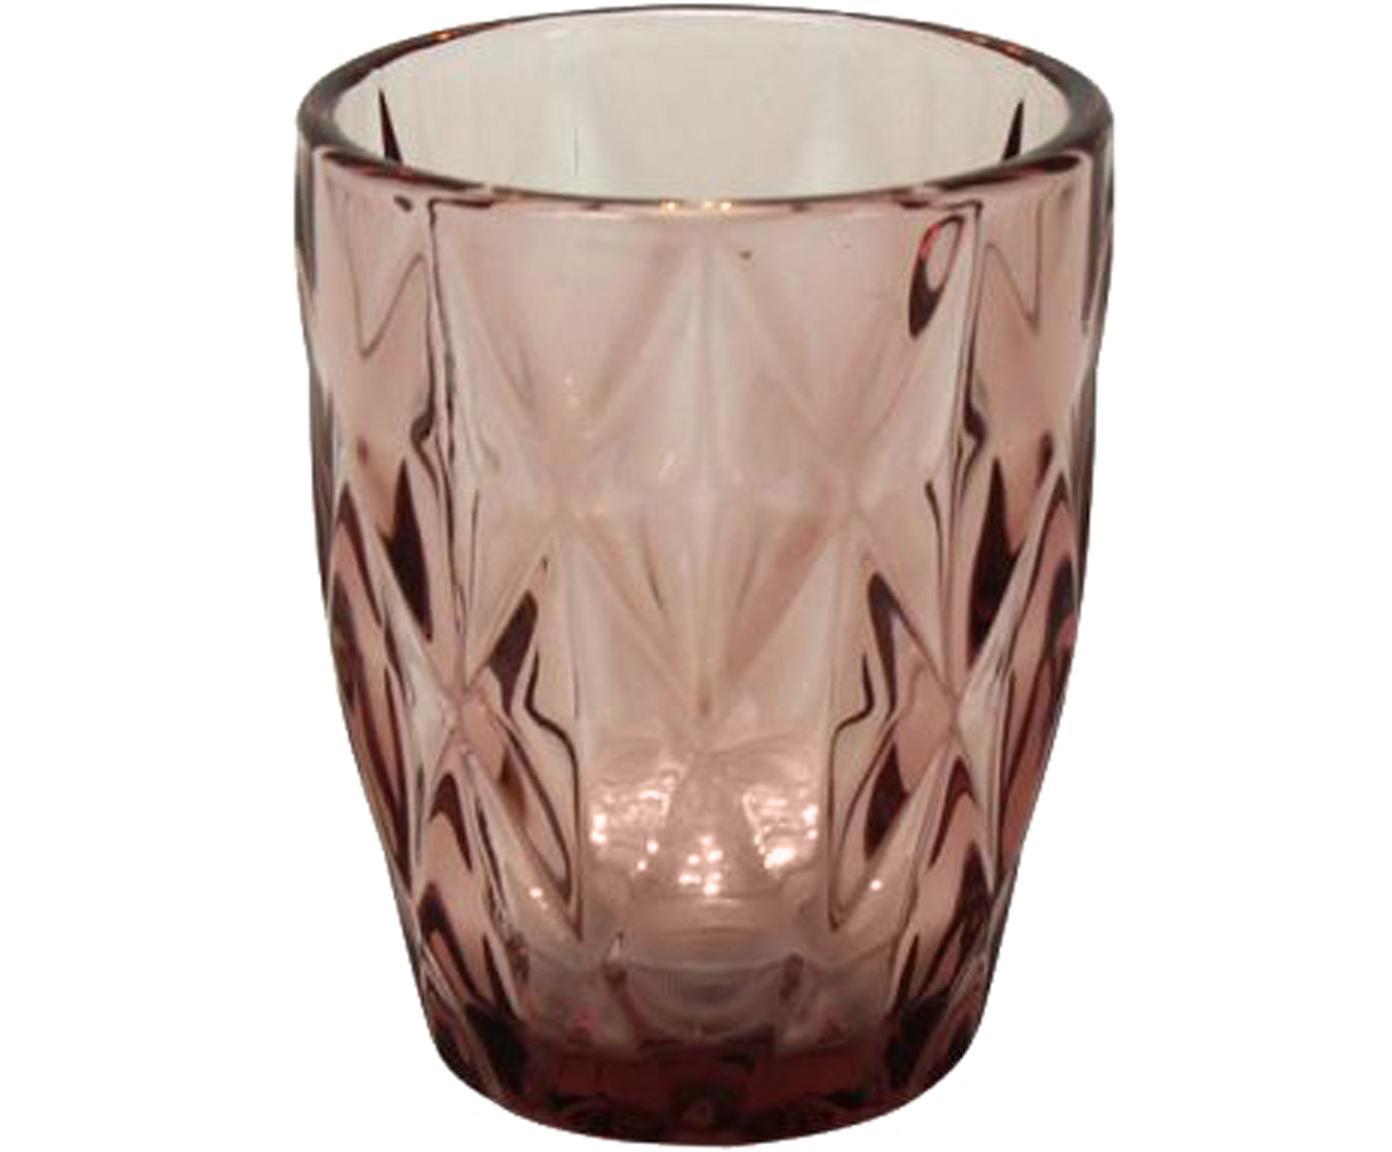 Wassergläser Lilania, 4er-Set, Glas, Lila, Ø 8 x H 10 cm